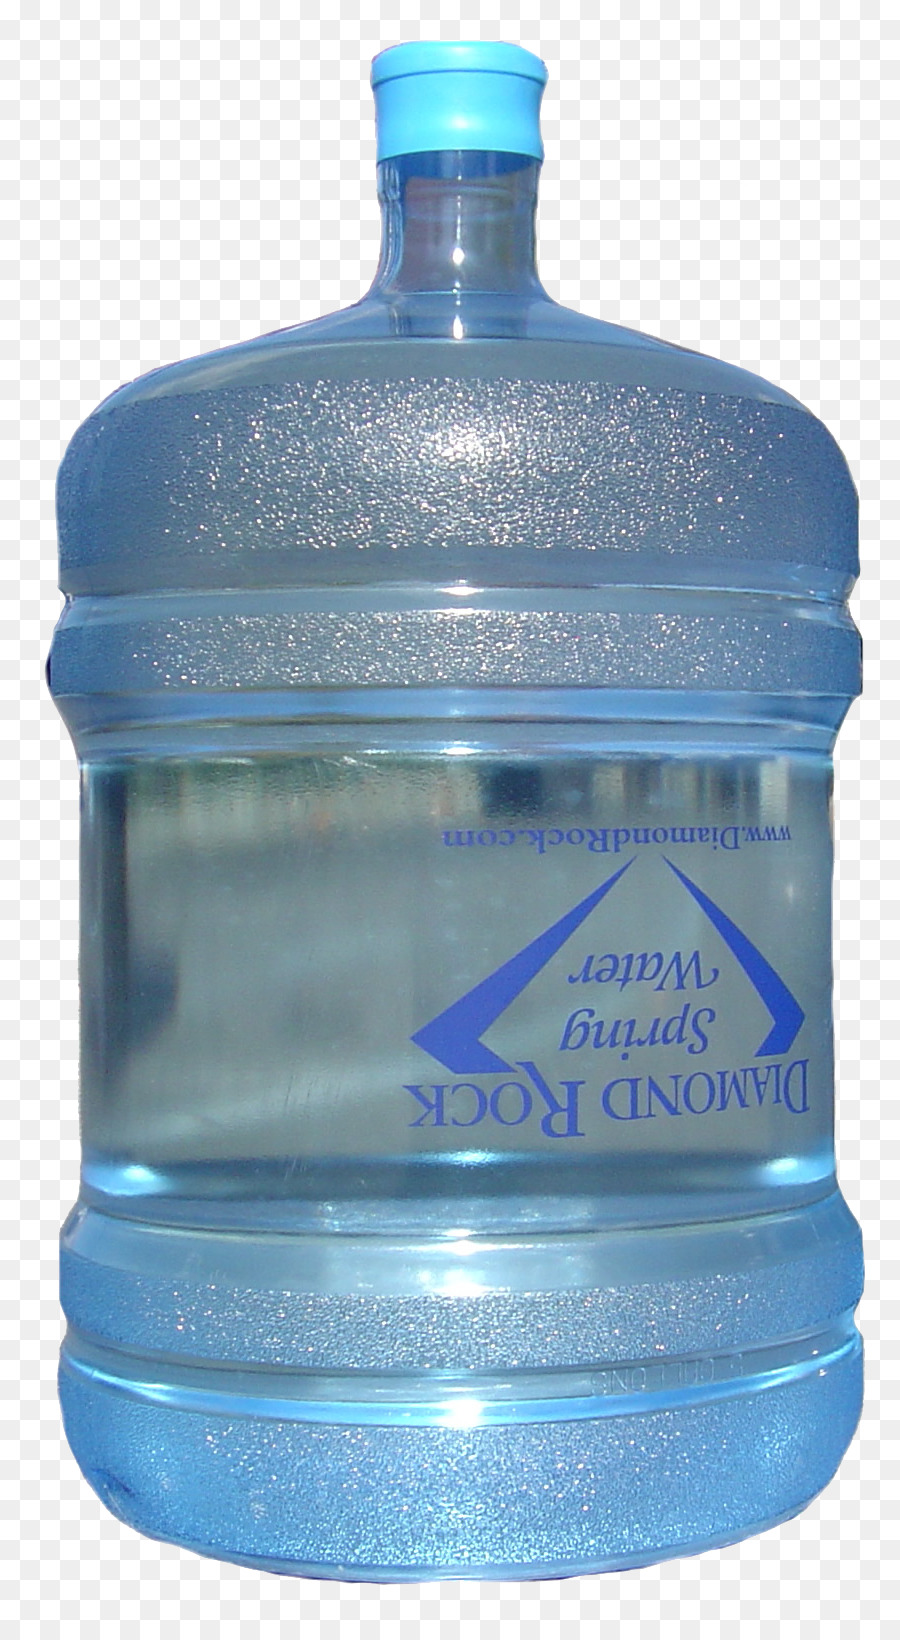 Descarga gratuita de Agua Destilada, Agua, Botella imágenes PNG